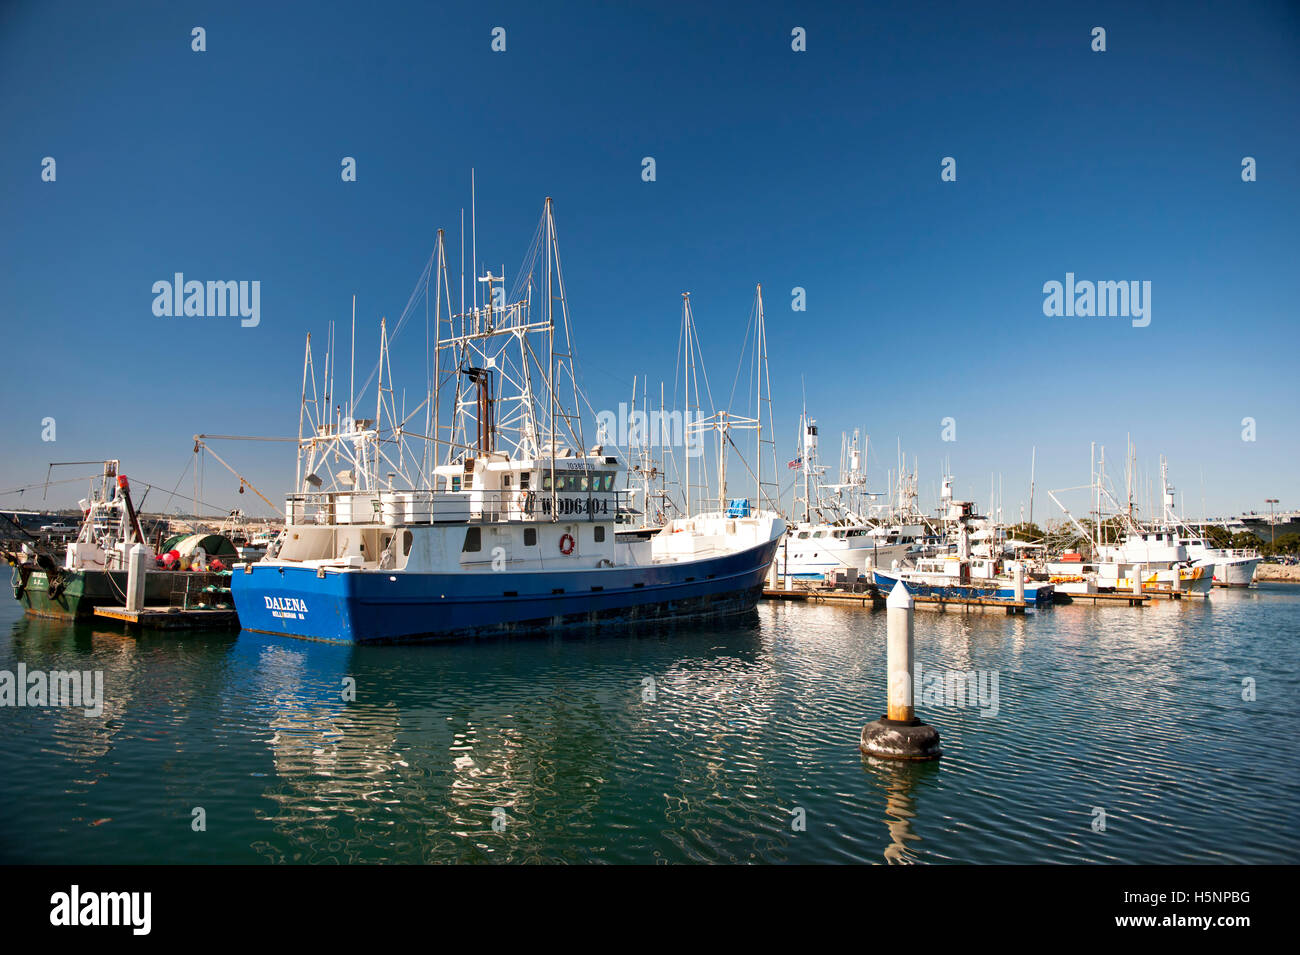 San Diego California Boating Marina - Stock Image